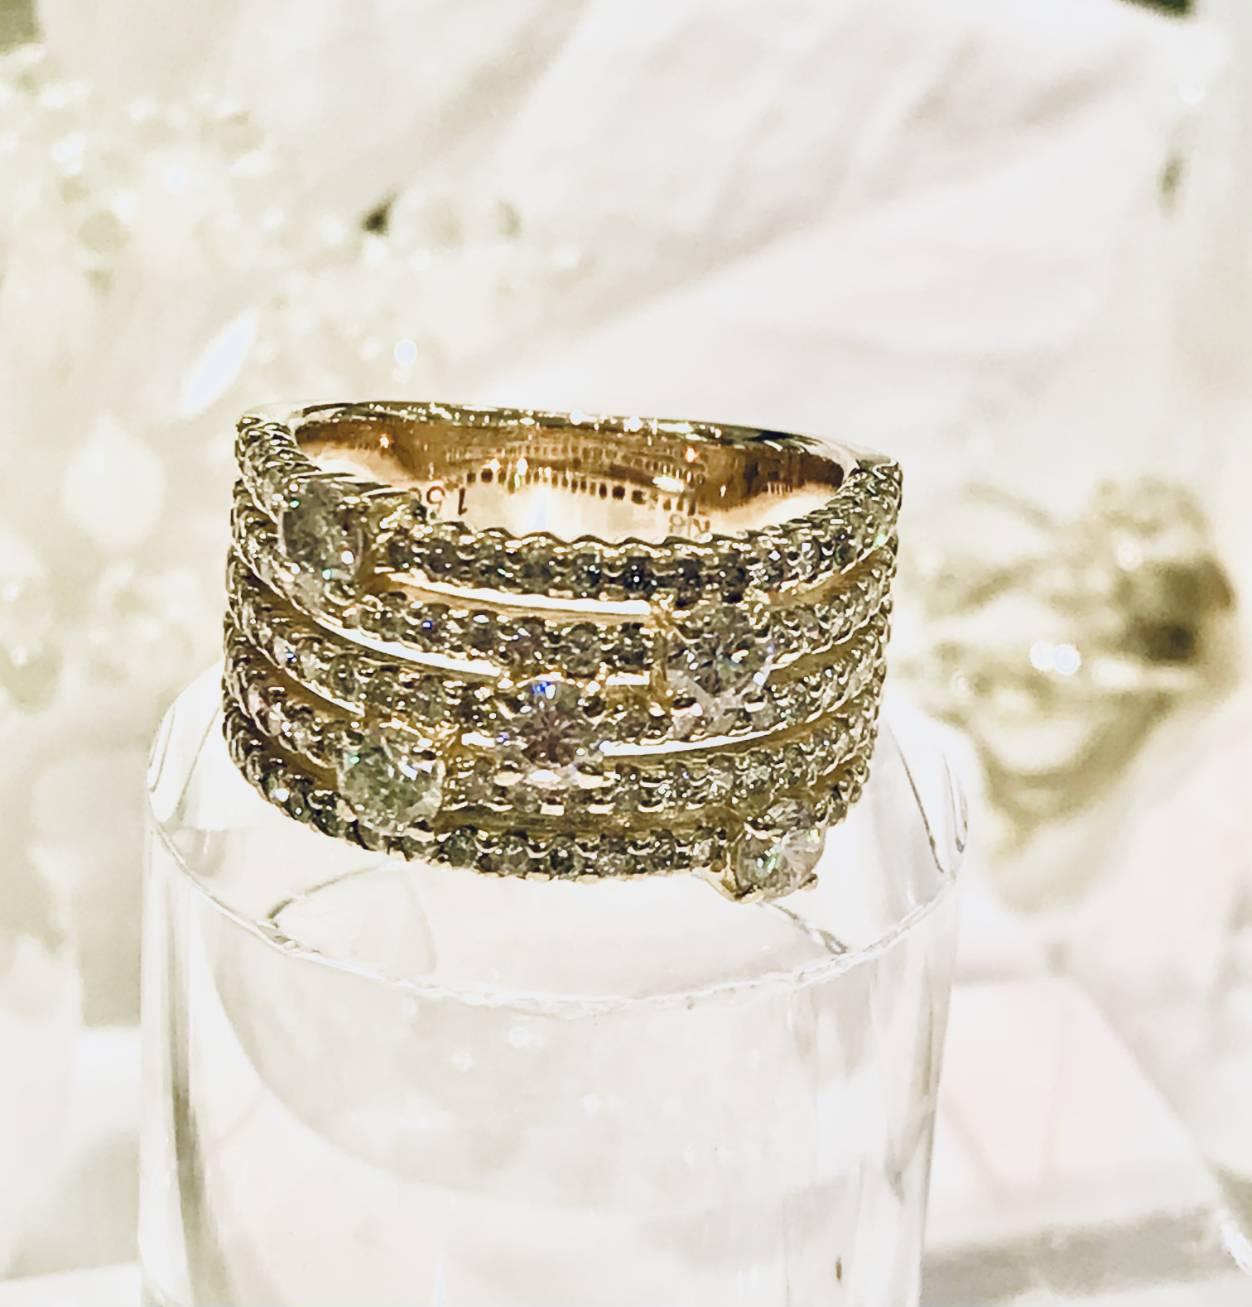 ■「K18 ダイヤモンド・リング サイズ直し」